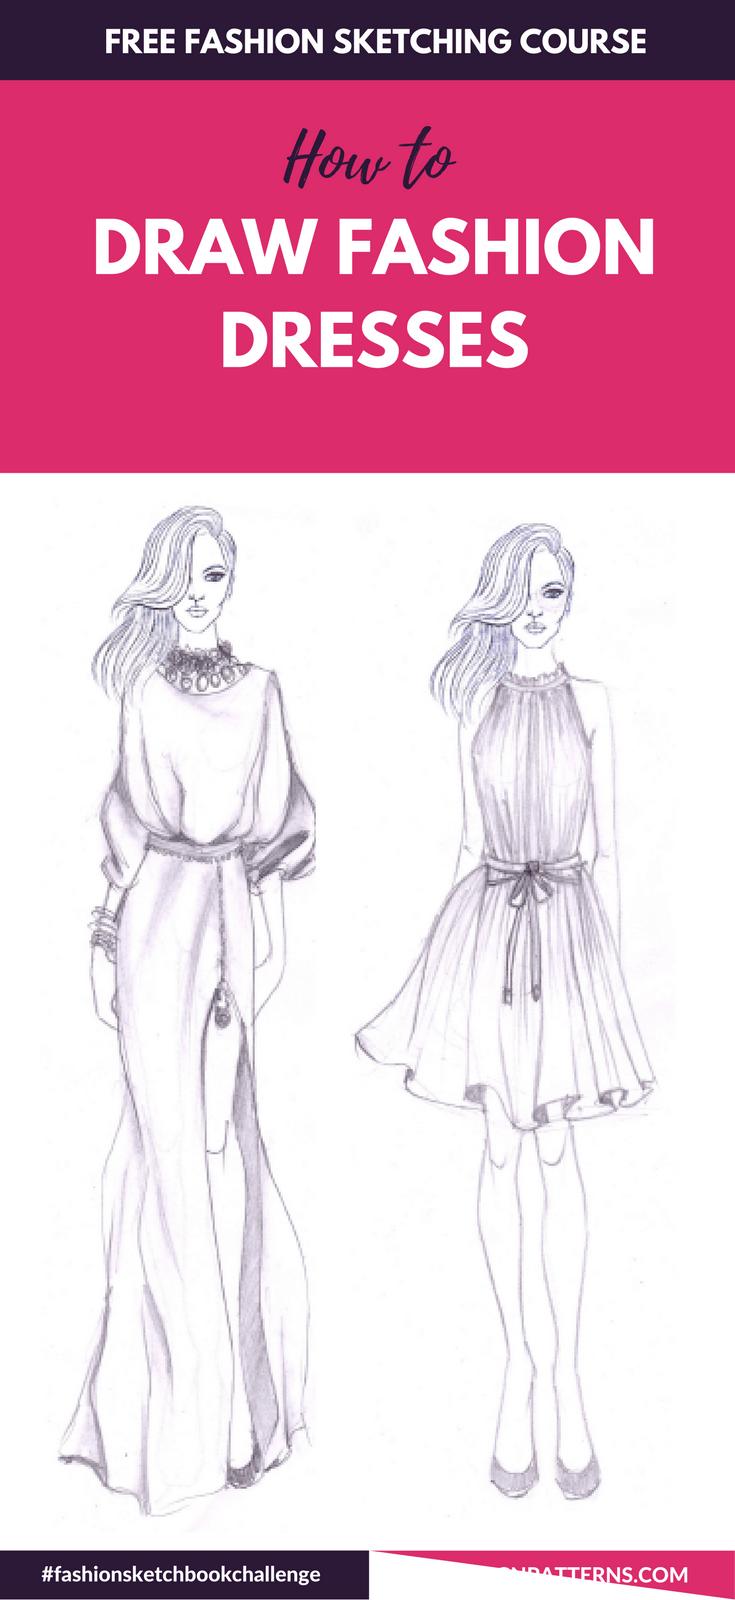 Fashion Sketch Like A Pro With Fashionsketchbookchallenge 30 Days Free Fahion Desi In 2020 Fashion Drawing Tutorial Fashion Drawing Sketches Fashion Design Sketchbook